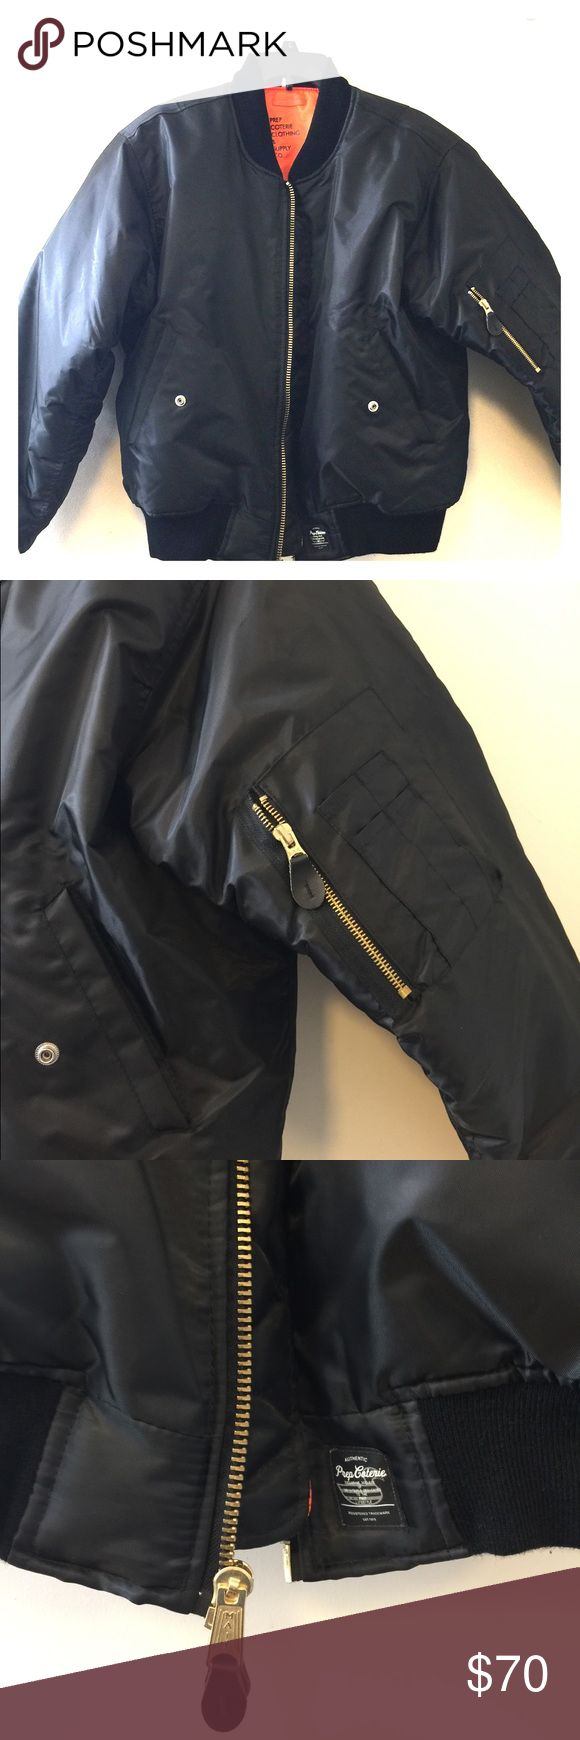 Prep Coterie lightweight Bomber Jacket Black with orange lining prep coterie Jackets & Coats Bomber & Varsity